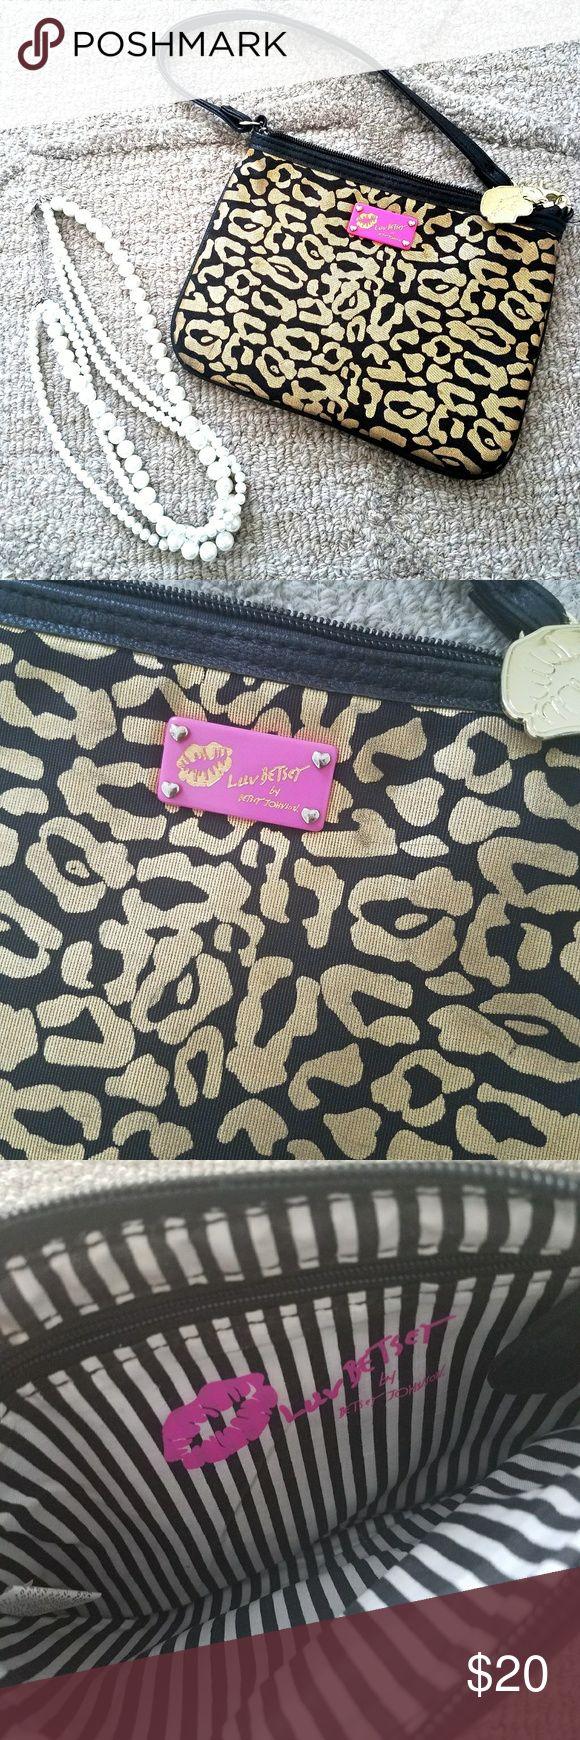 best 25+ animal print clutch bags ideas on pinterest | animal